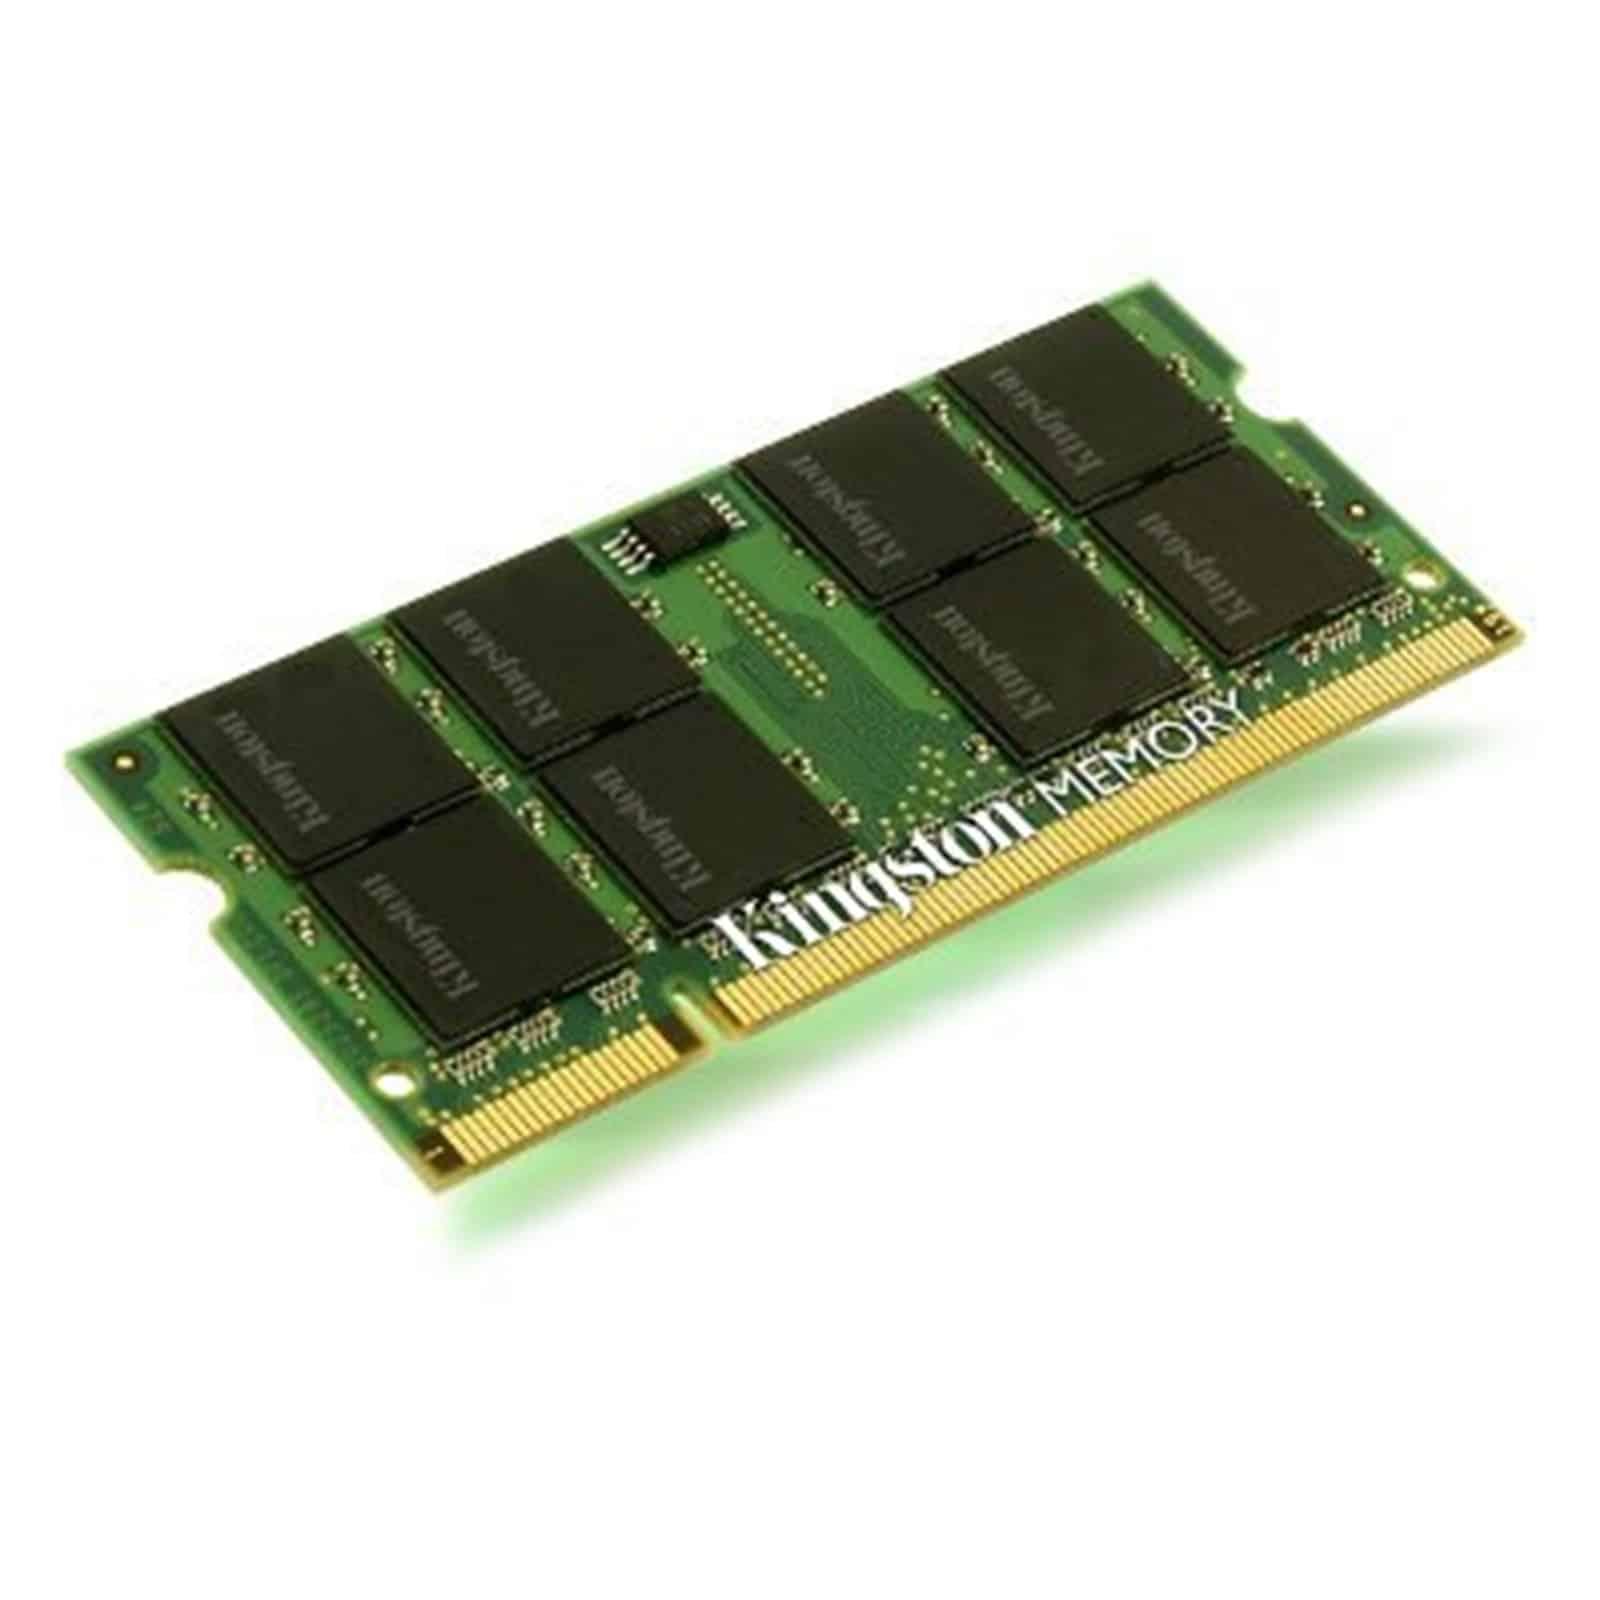 Kingston 8GB DDR3 PC3 12800 SODIMM (1600MHz)